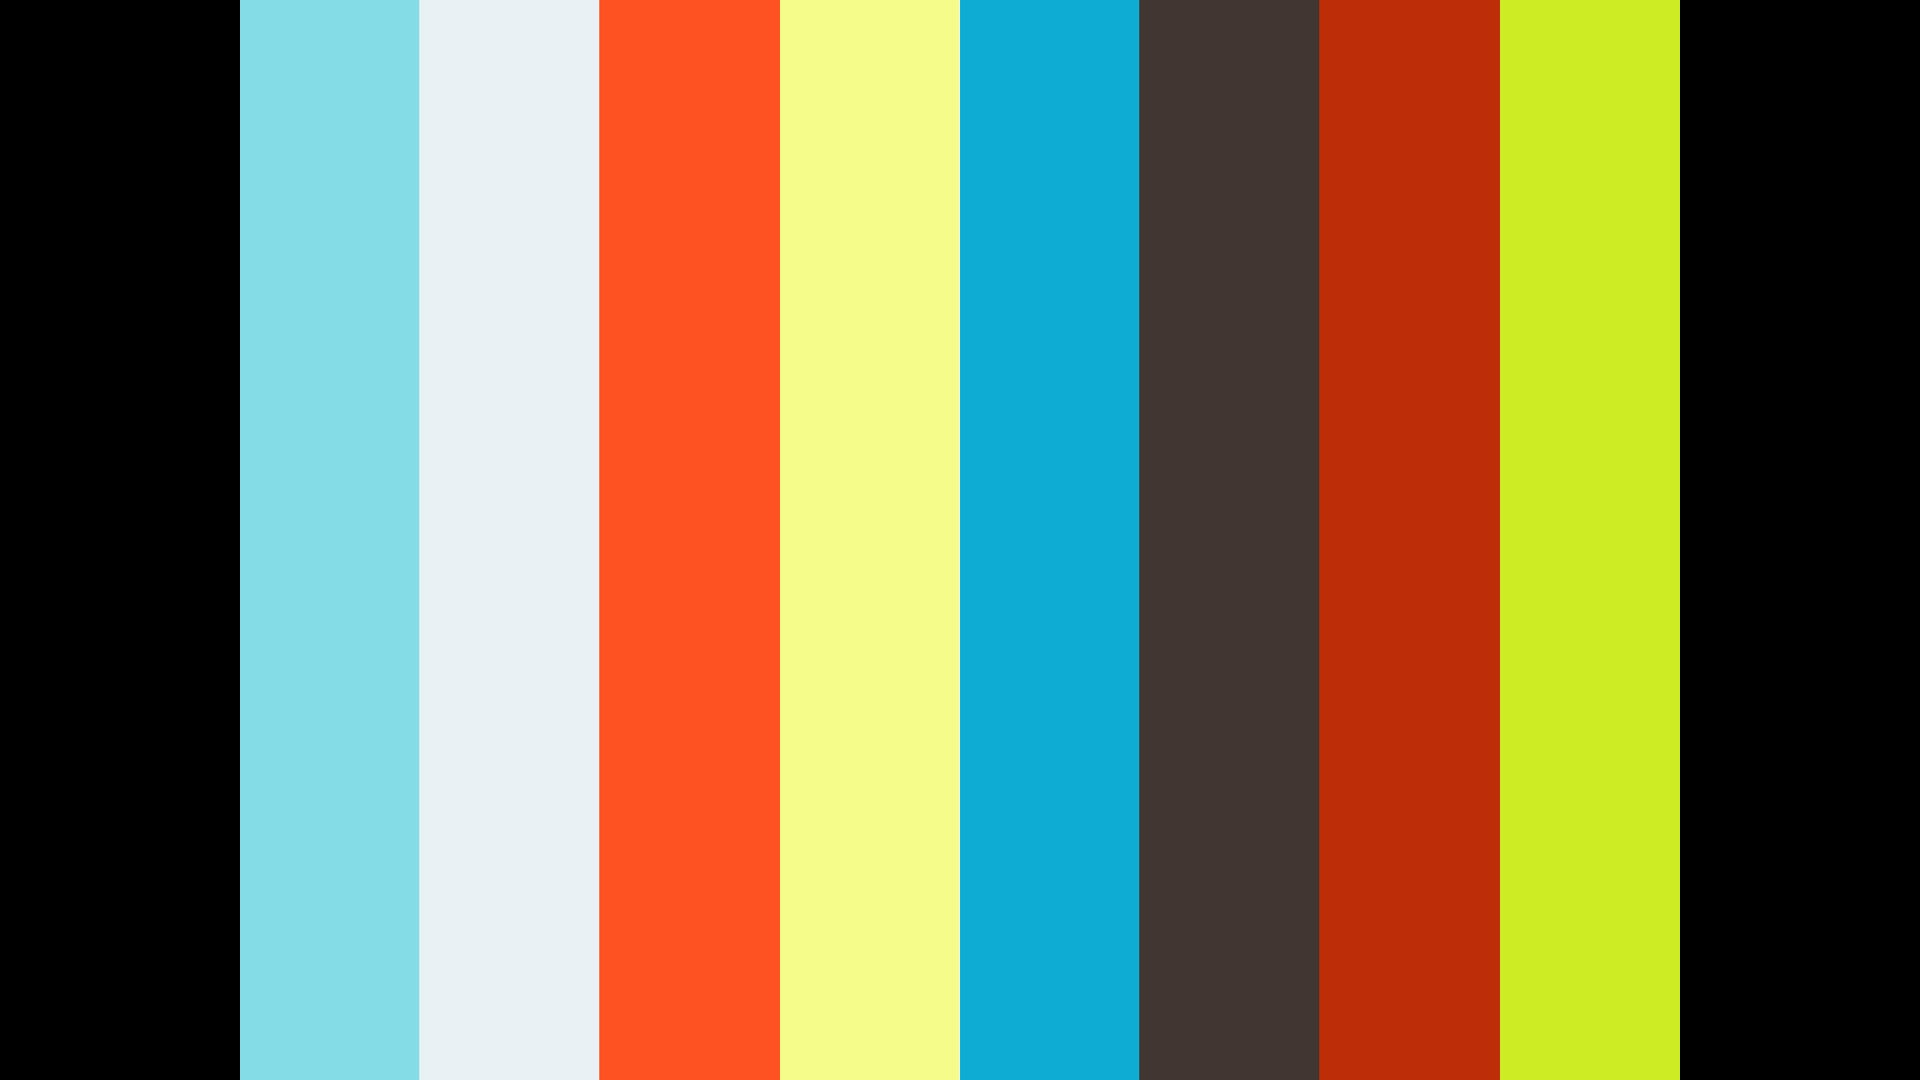 15.7 Project documentation - Labels